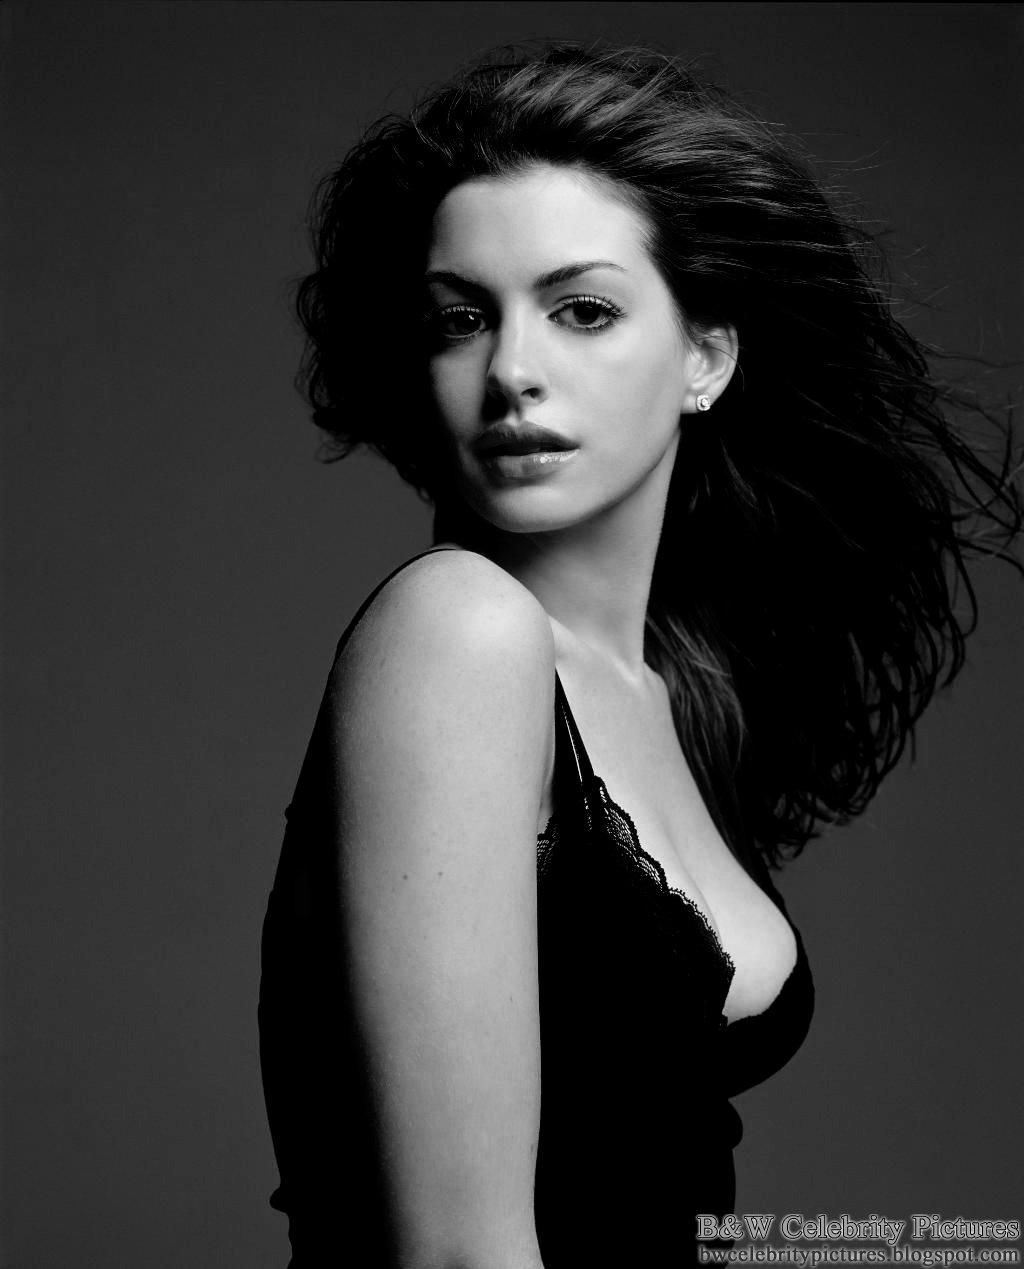 anne-hathaway-05-vanity-fair-black-white_pgmii8.jpg